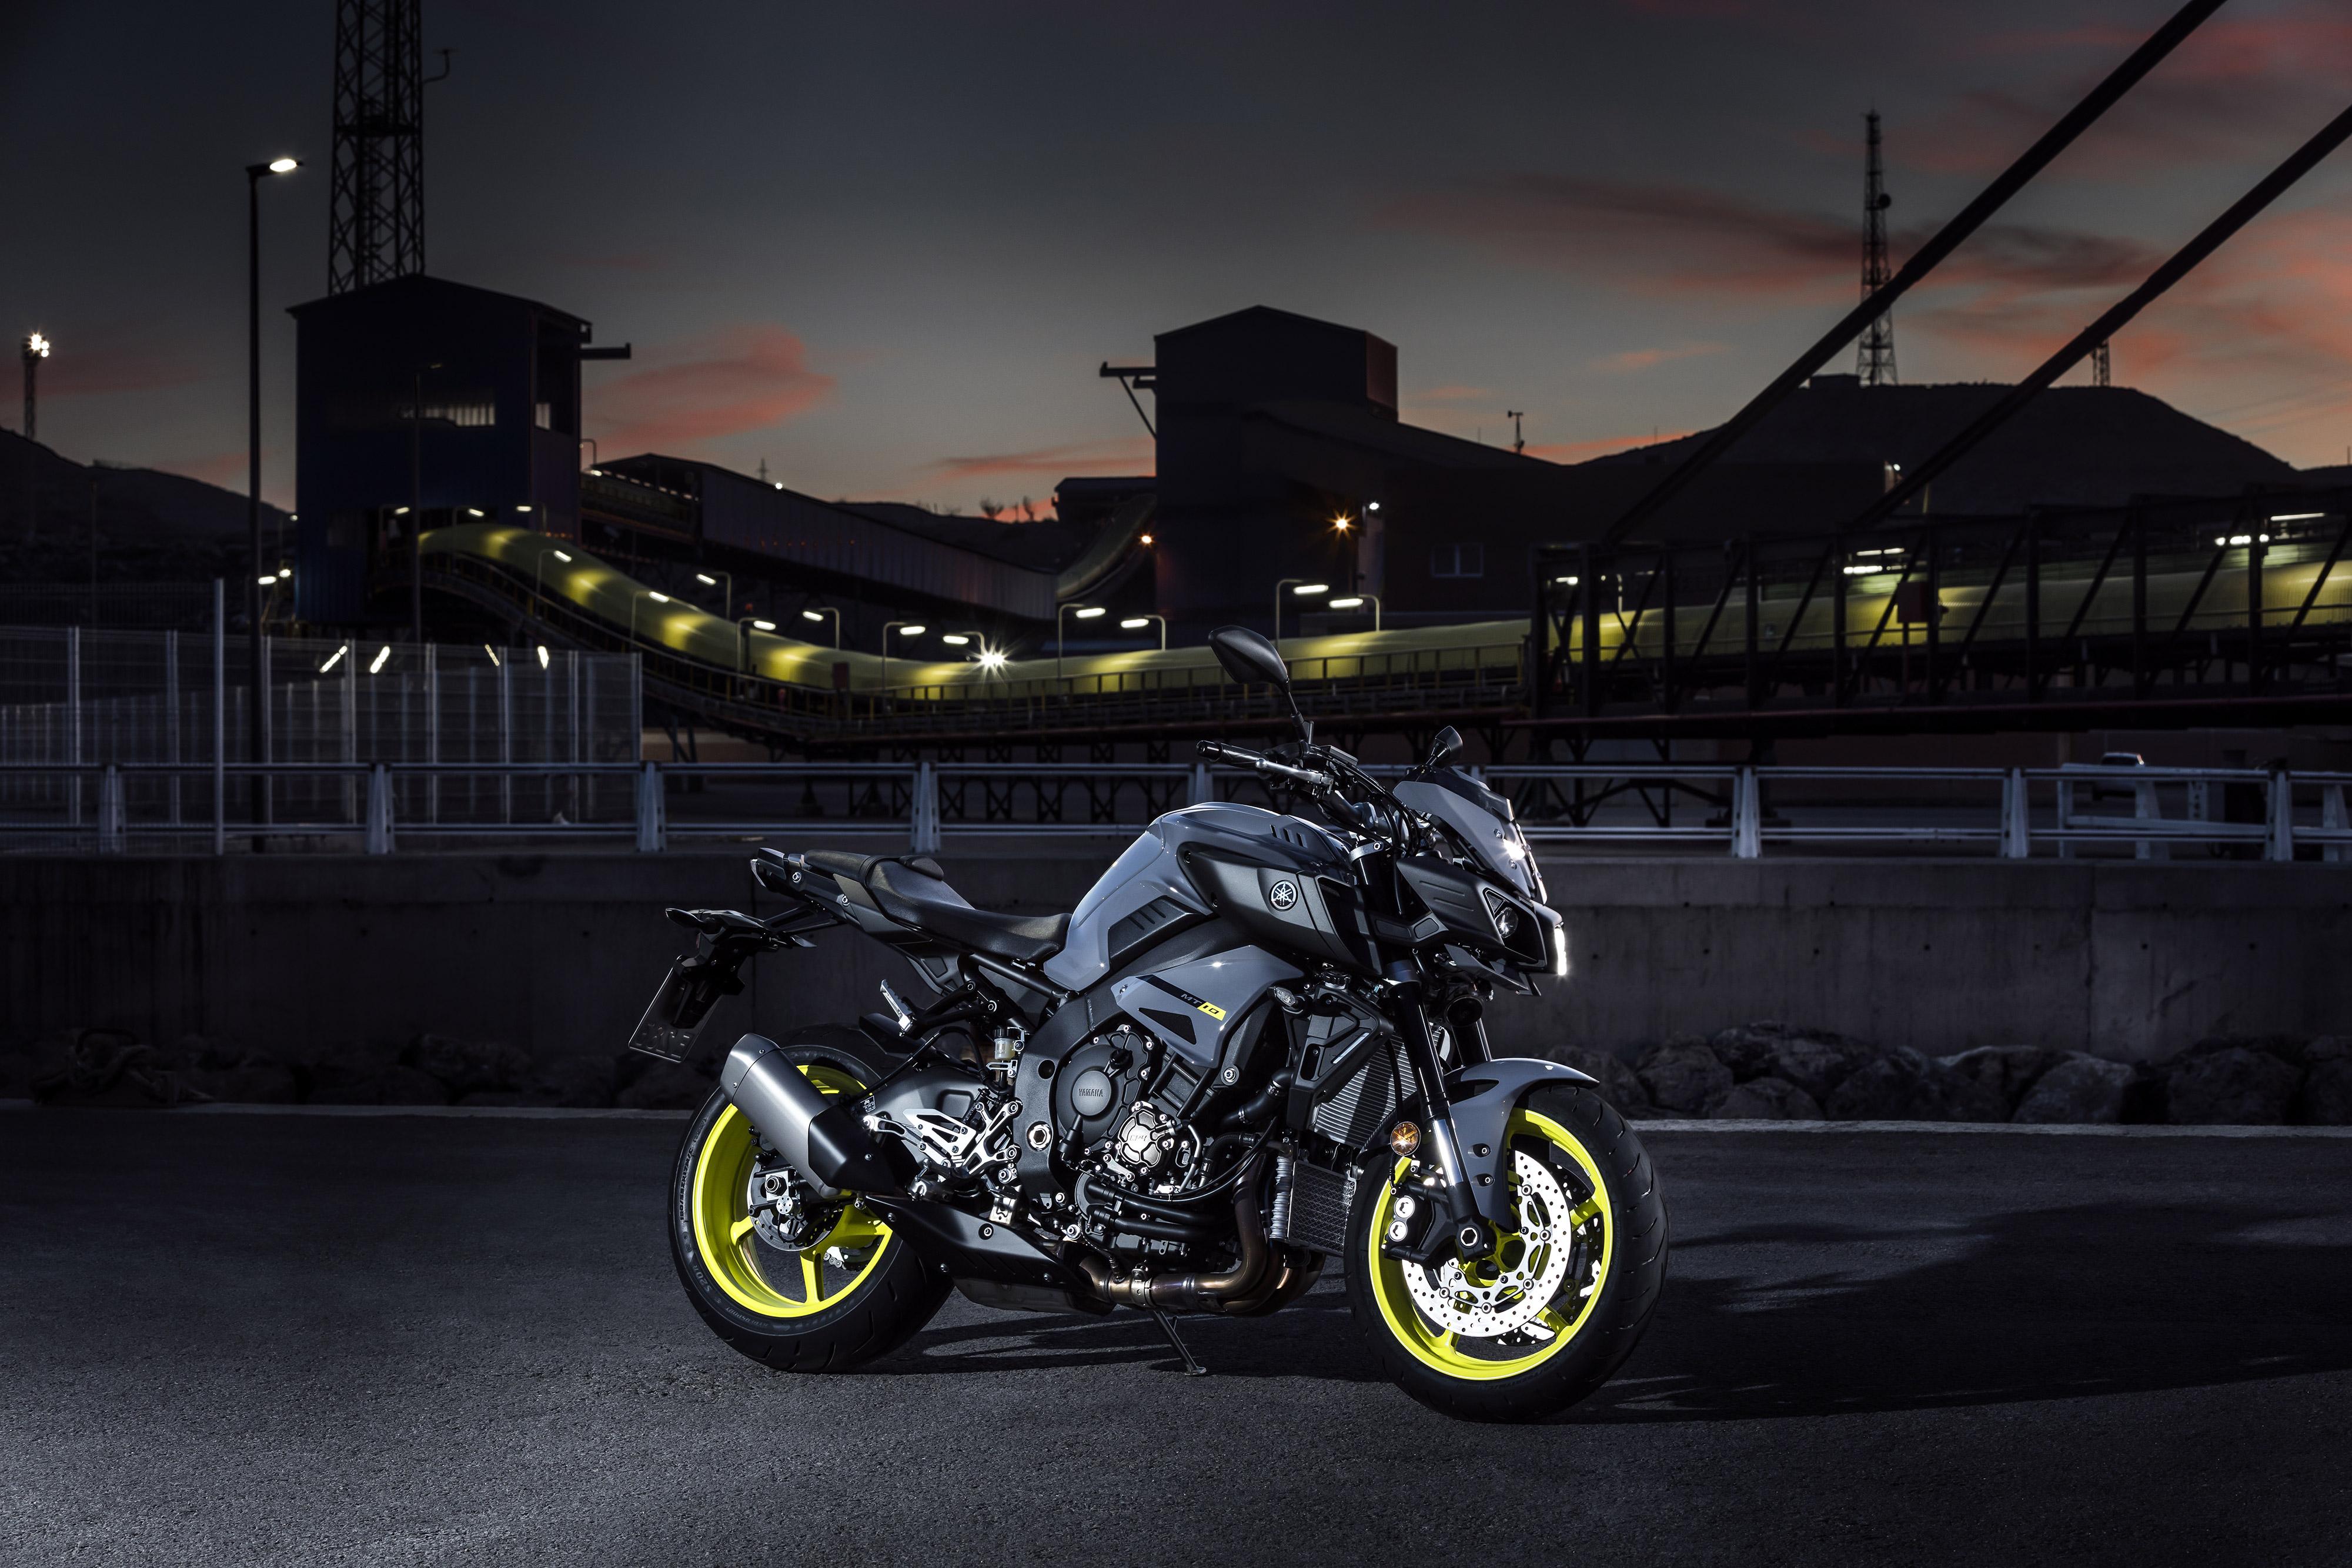 2017 Yamaha MT 10, HD Bikes, 4k Wallpapers, Images